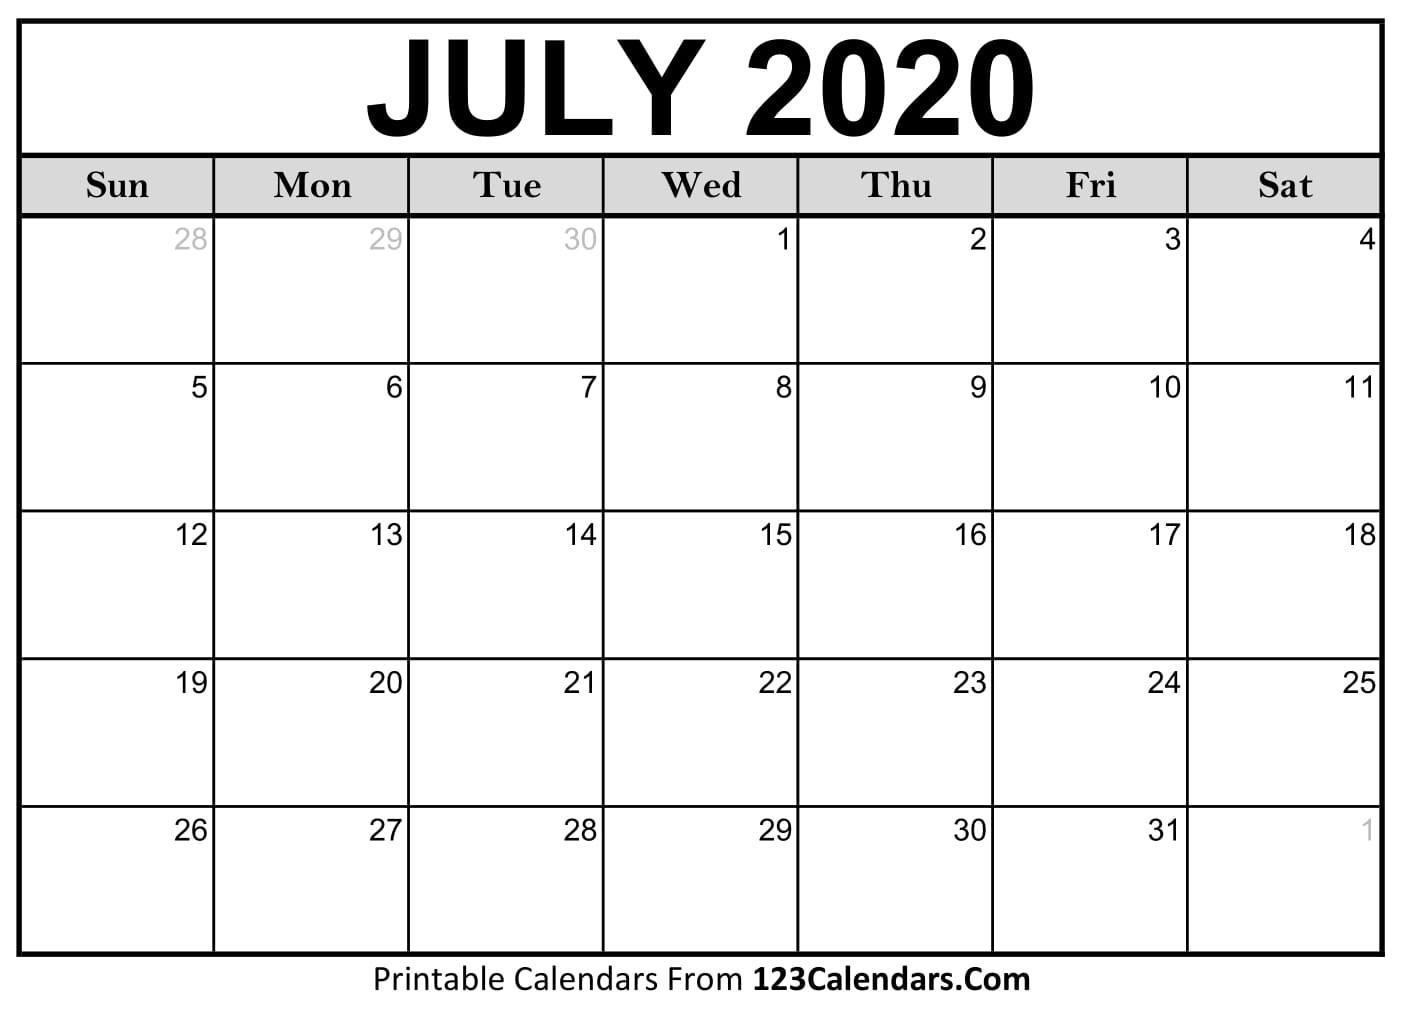 July 2020 Printable Calendar   123Calendars-June July 2020 Monthly